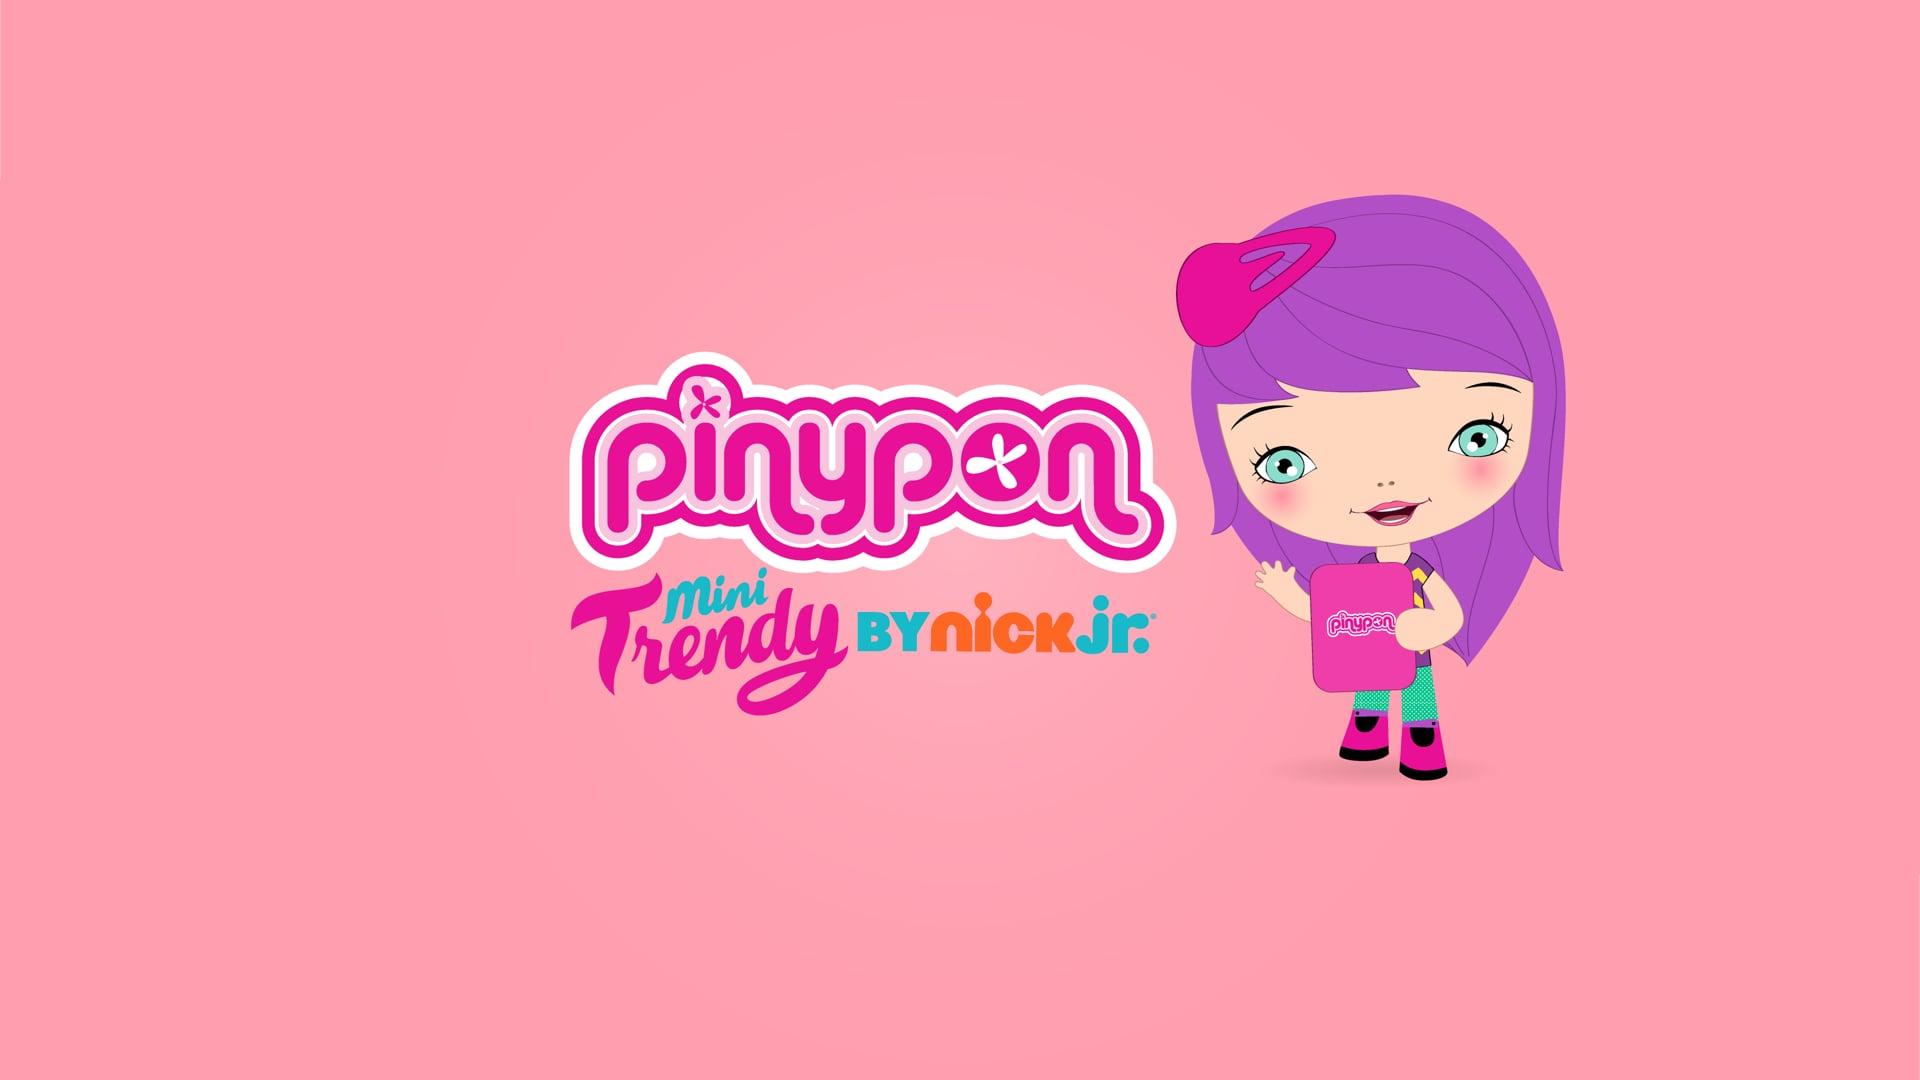 Pinypon, Mini Trendy, Nick.